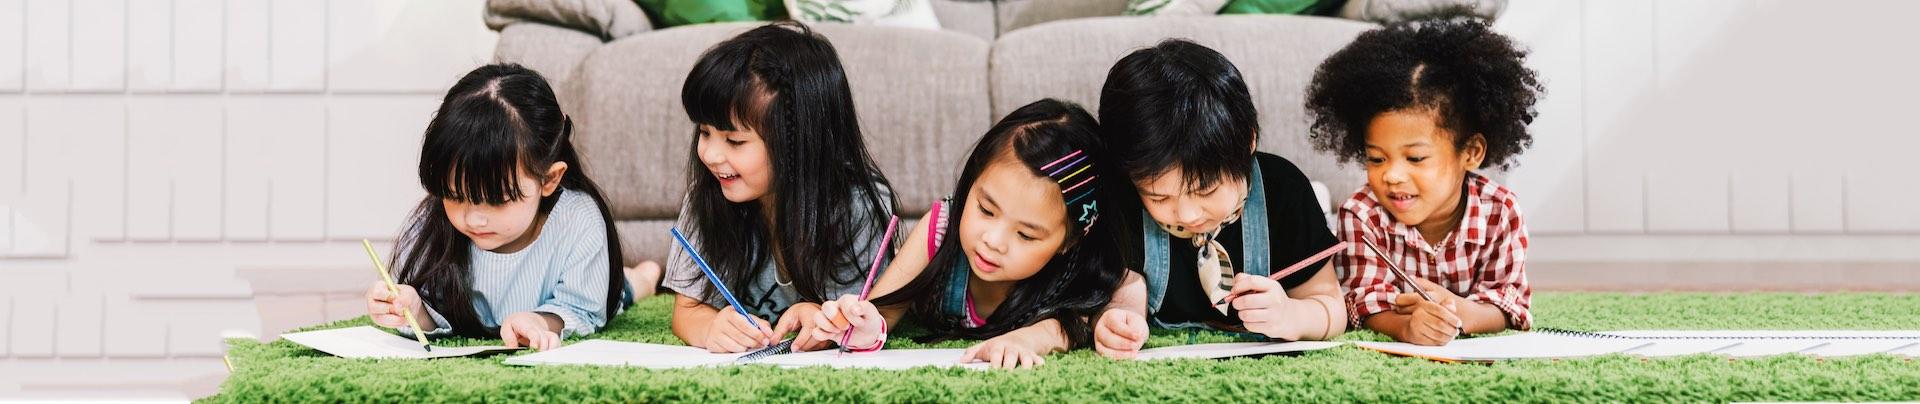 Kids Writing While Lying Down